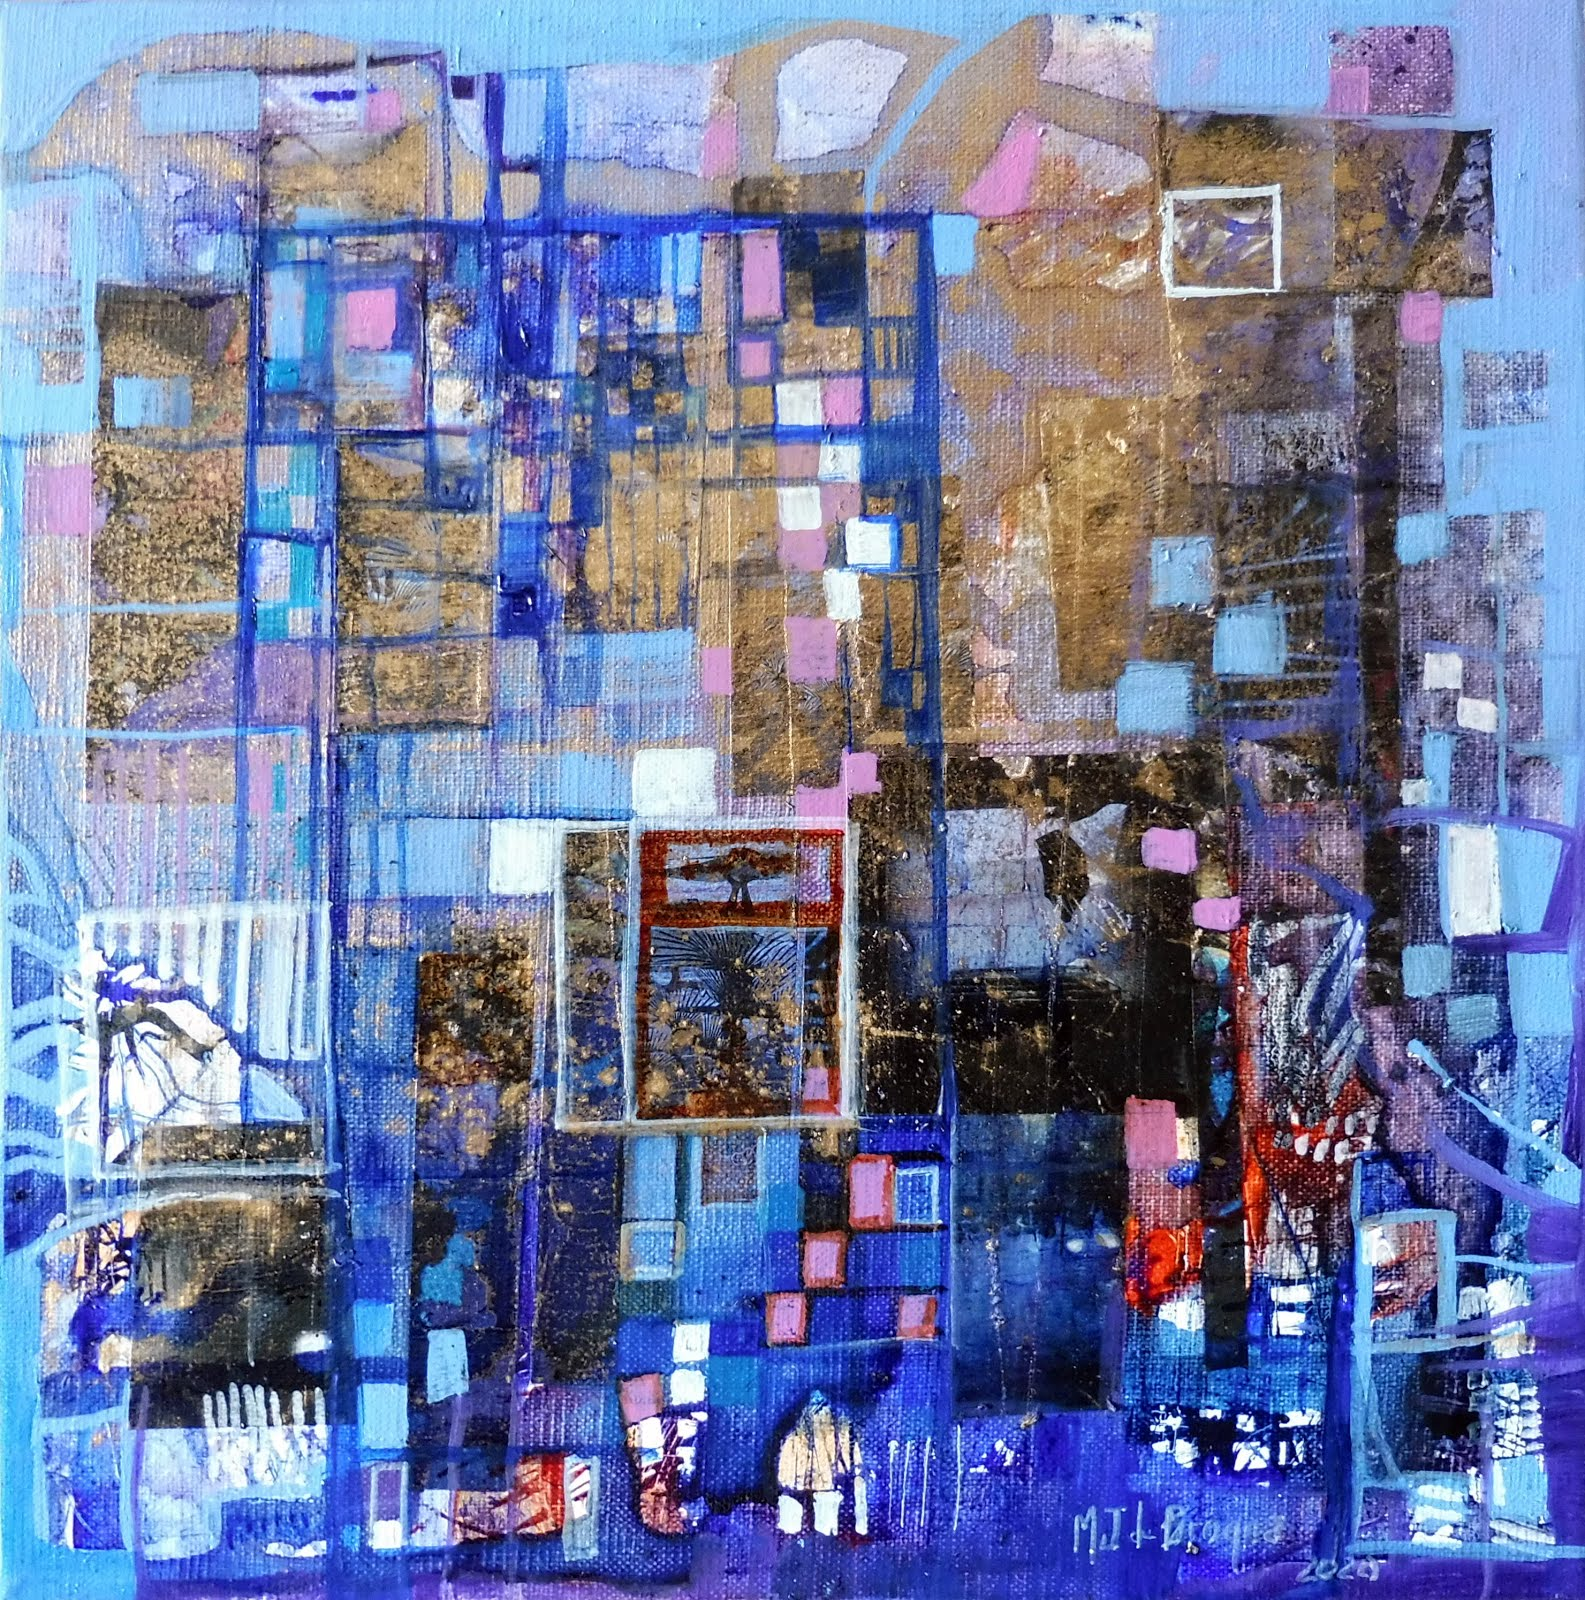 Petite porte bleue - 30 x 30 cm - 2020